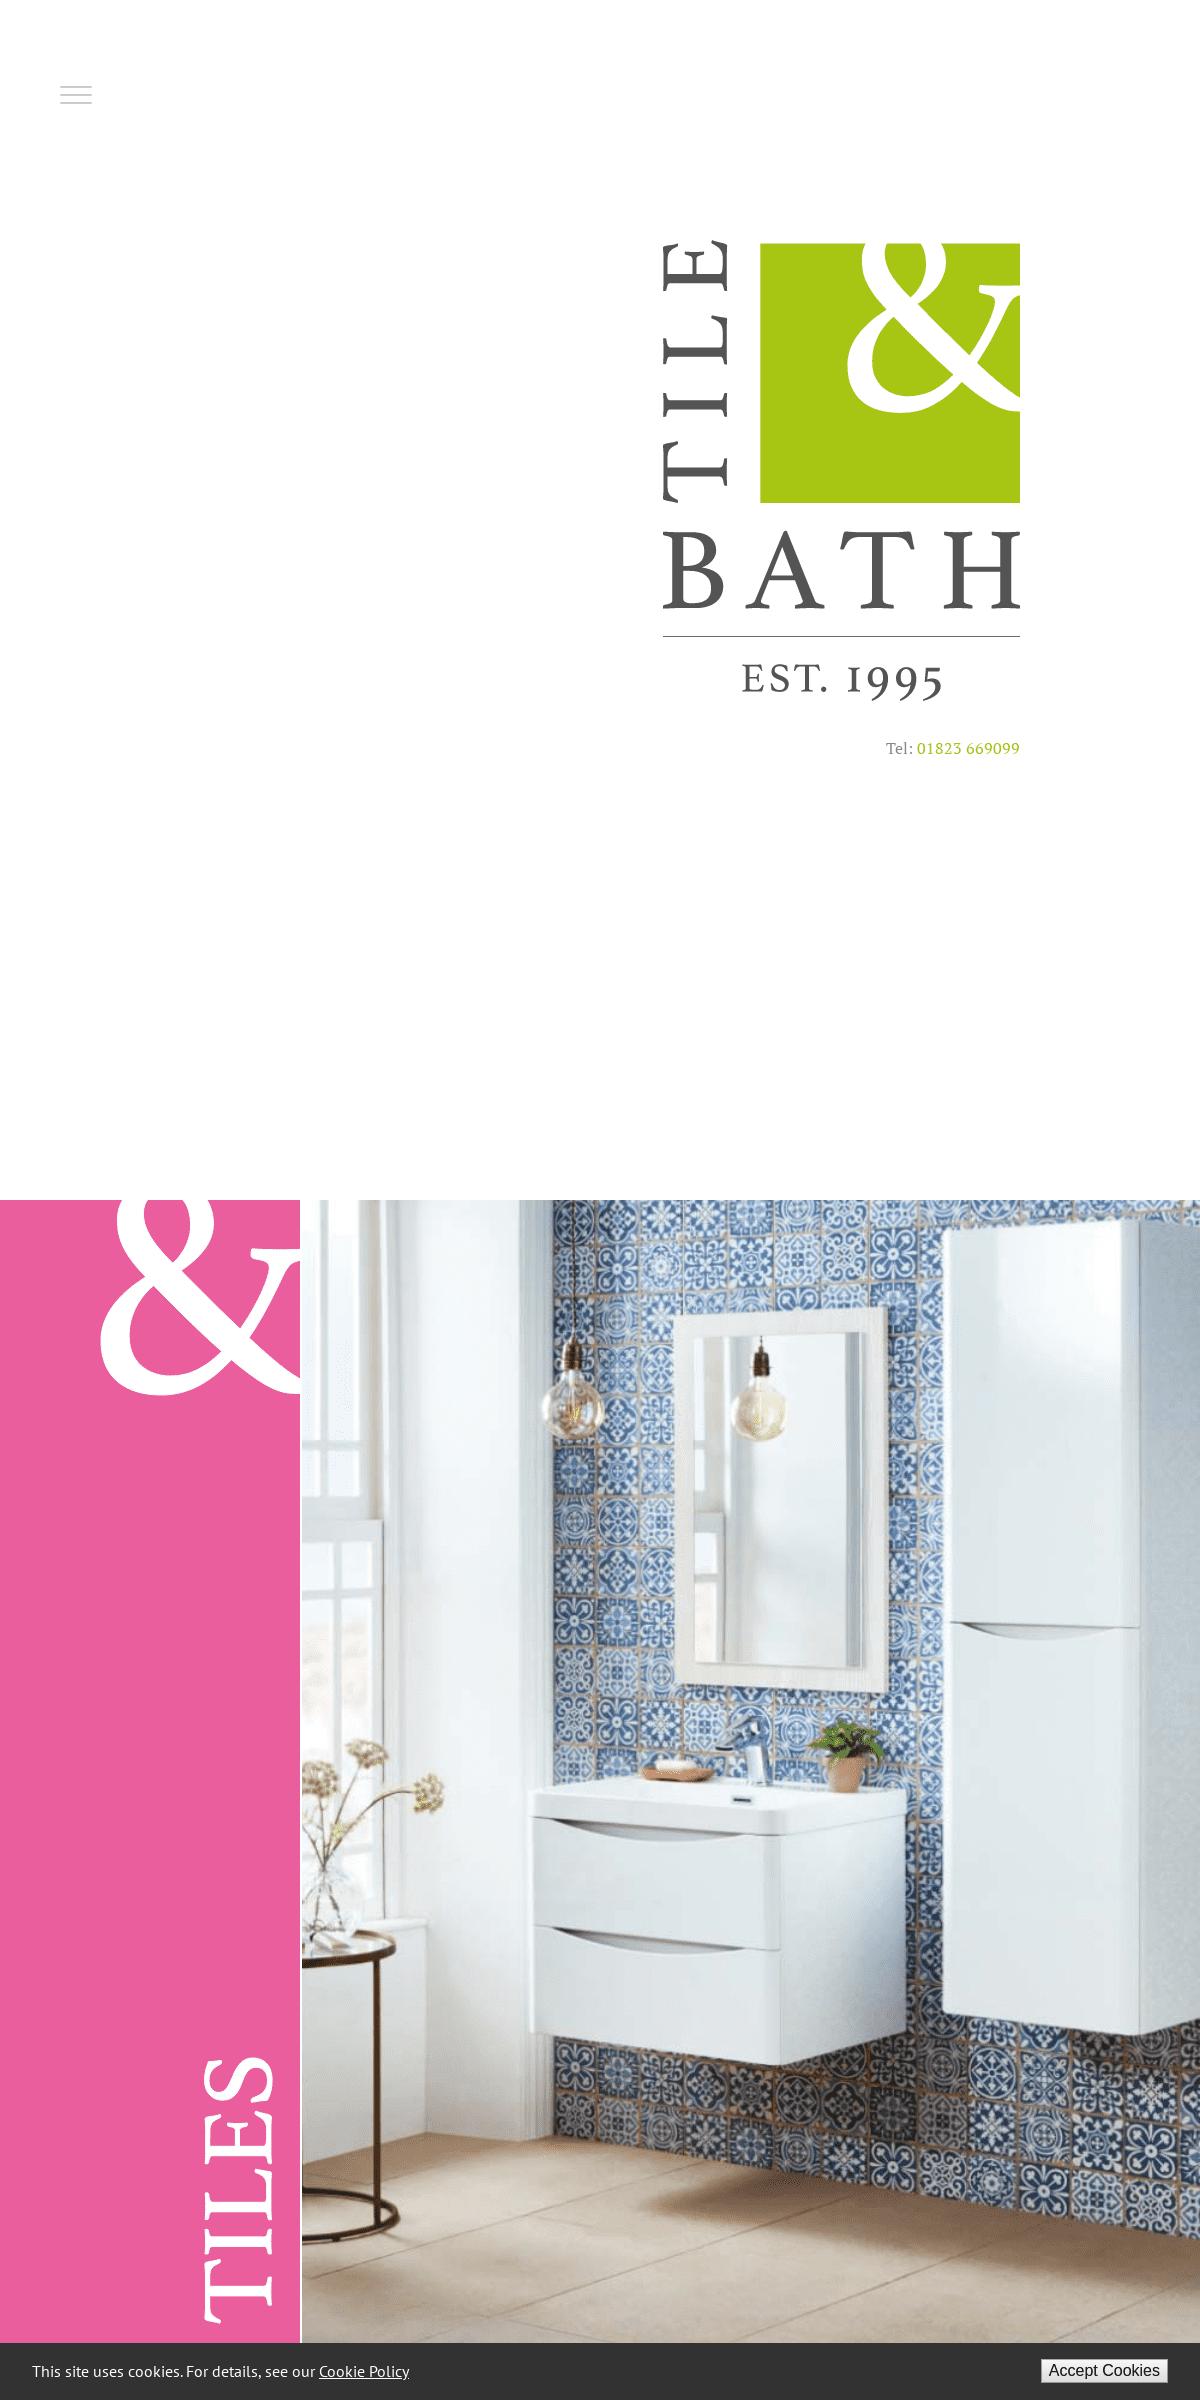 Tile and Bath World - Tiles, Baths, Showers, Taps - Wellington, Somerset, UK